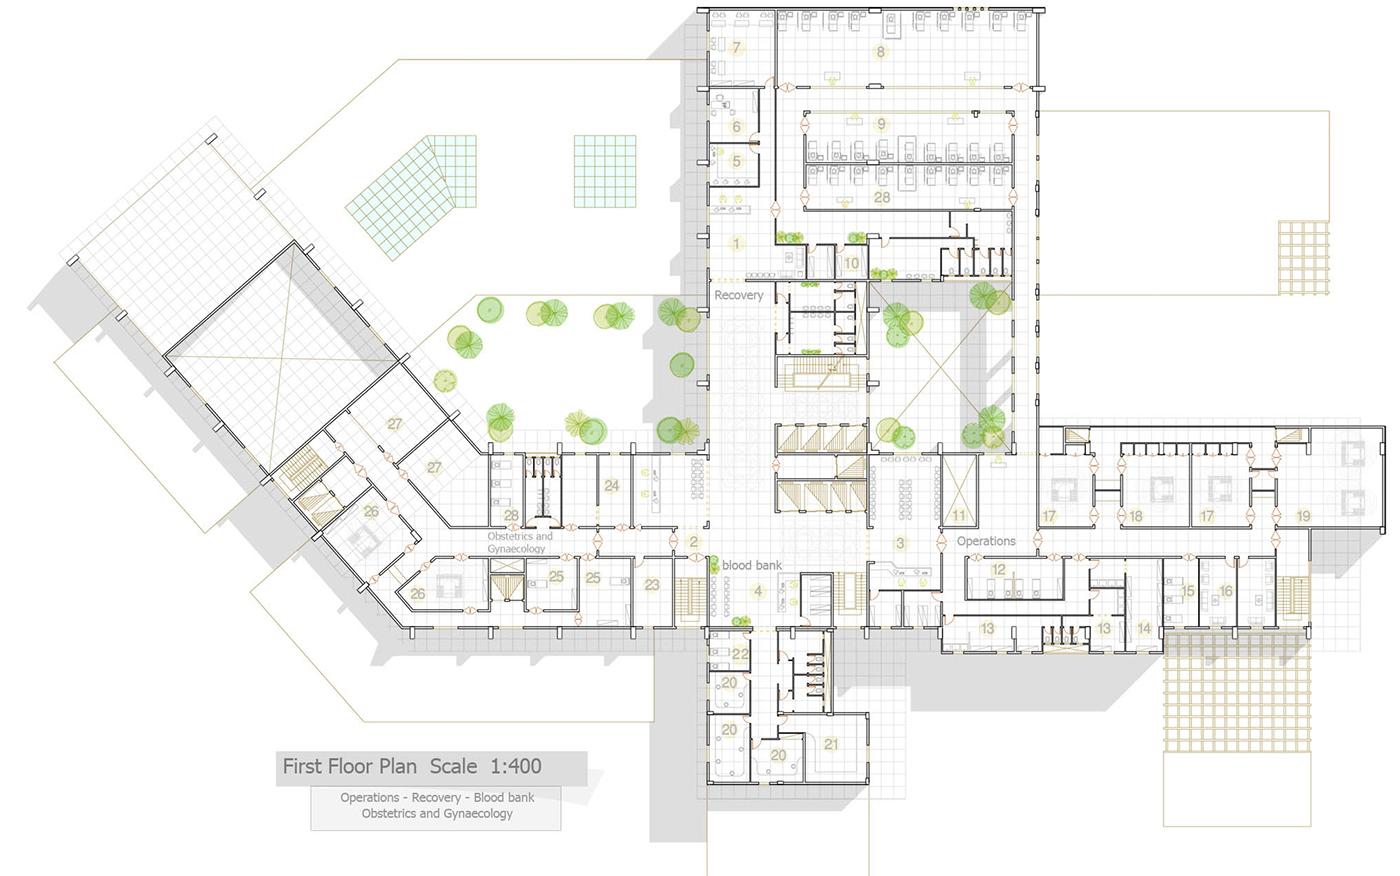 Business plan for Hospital